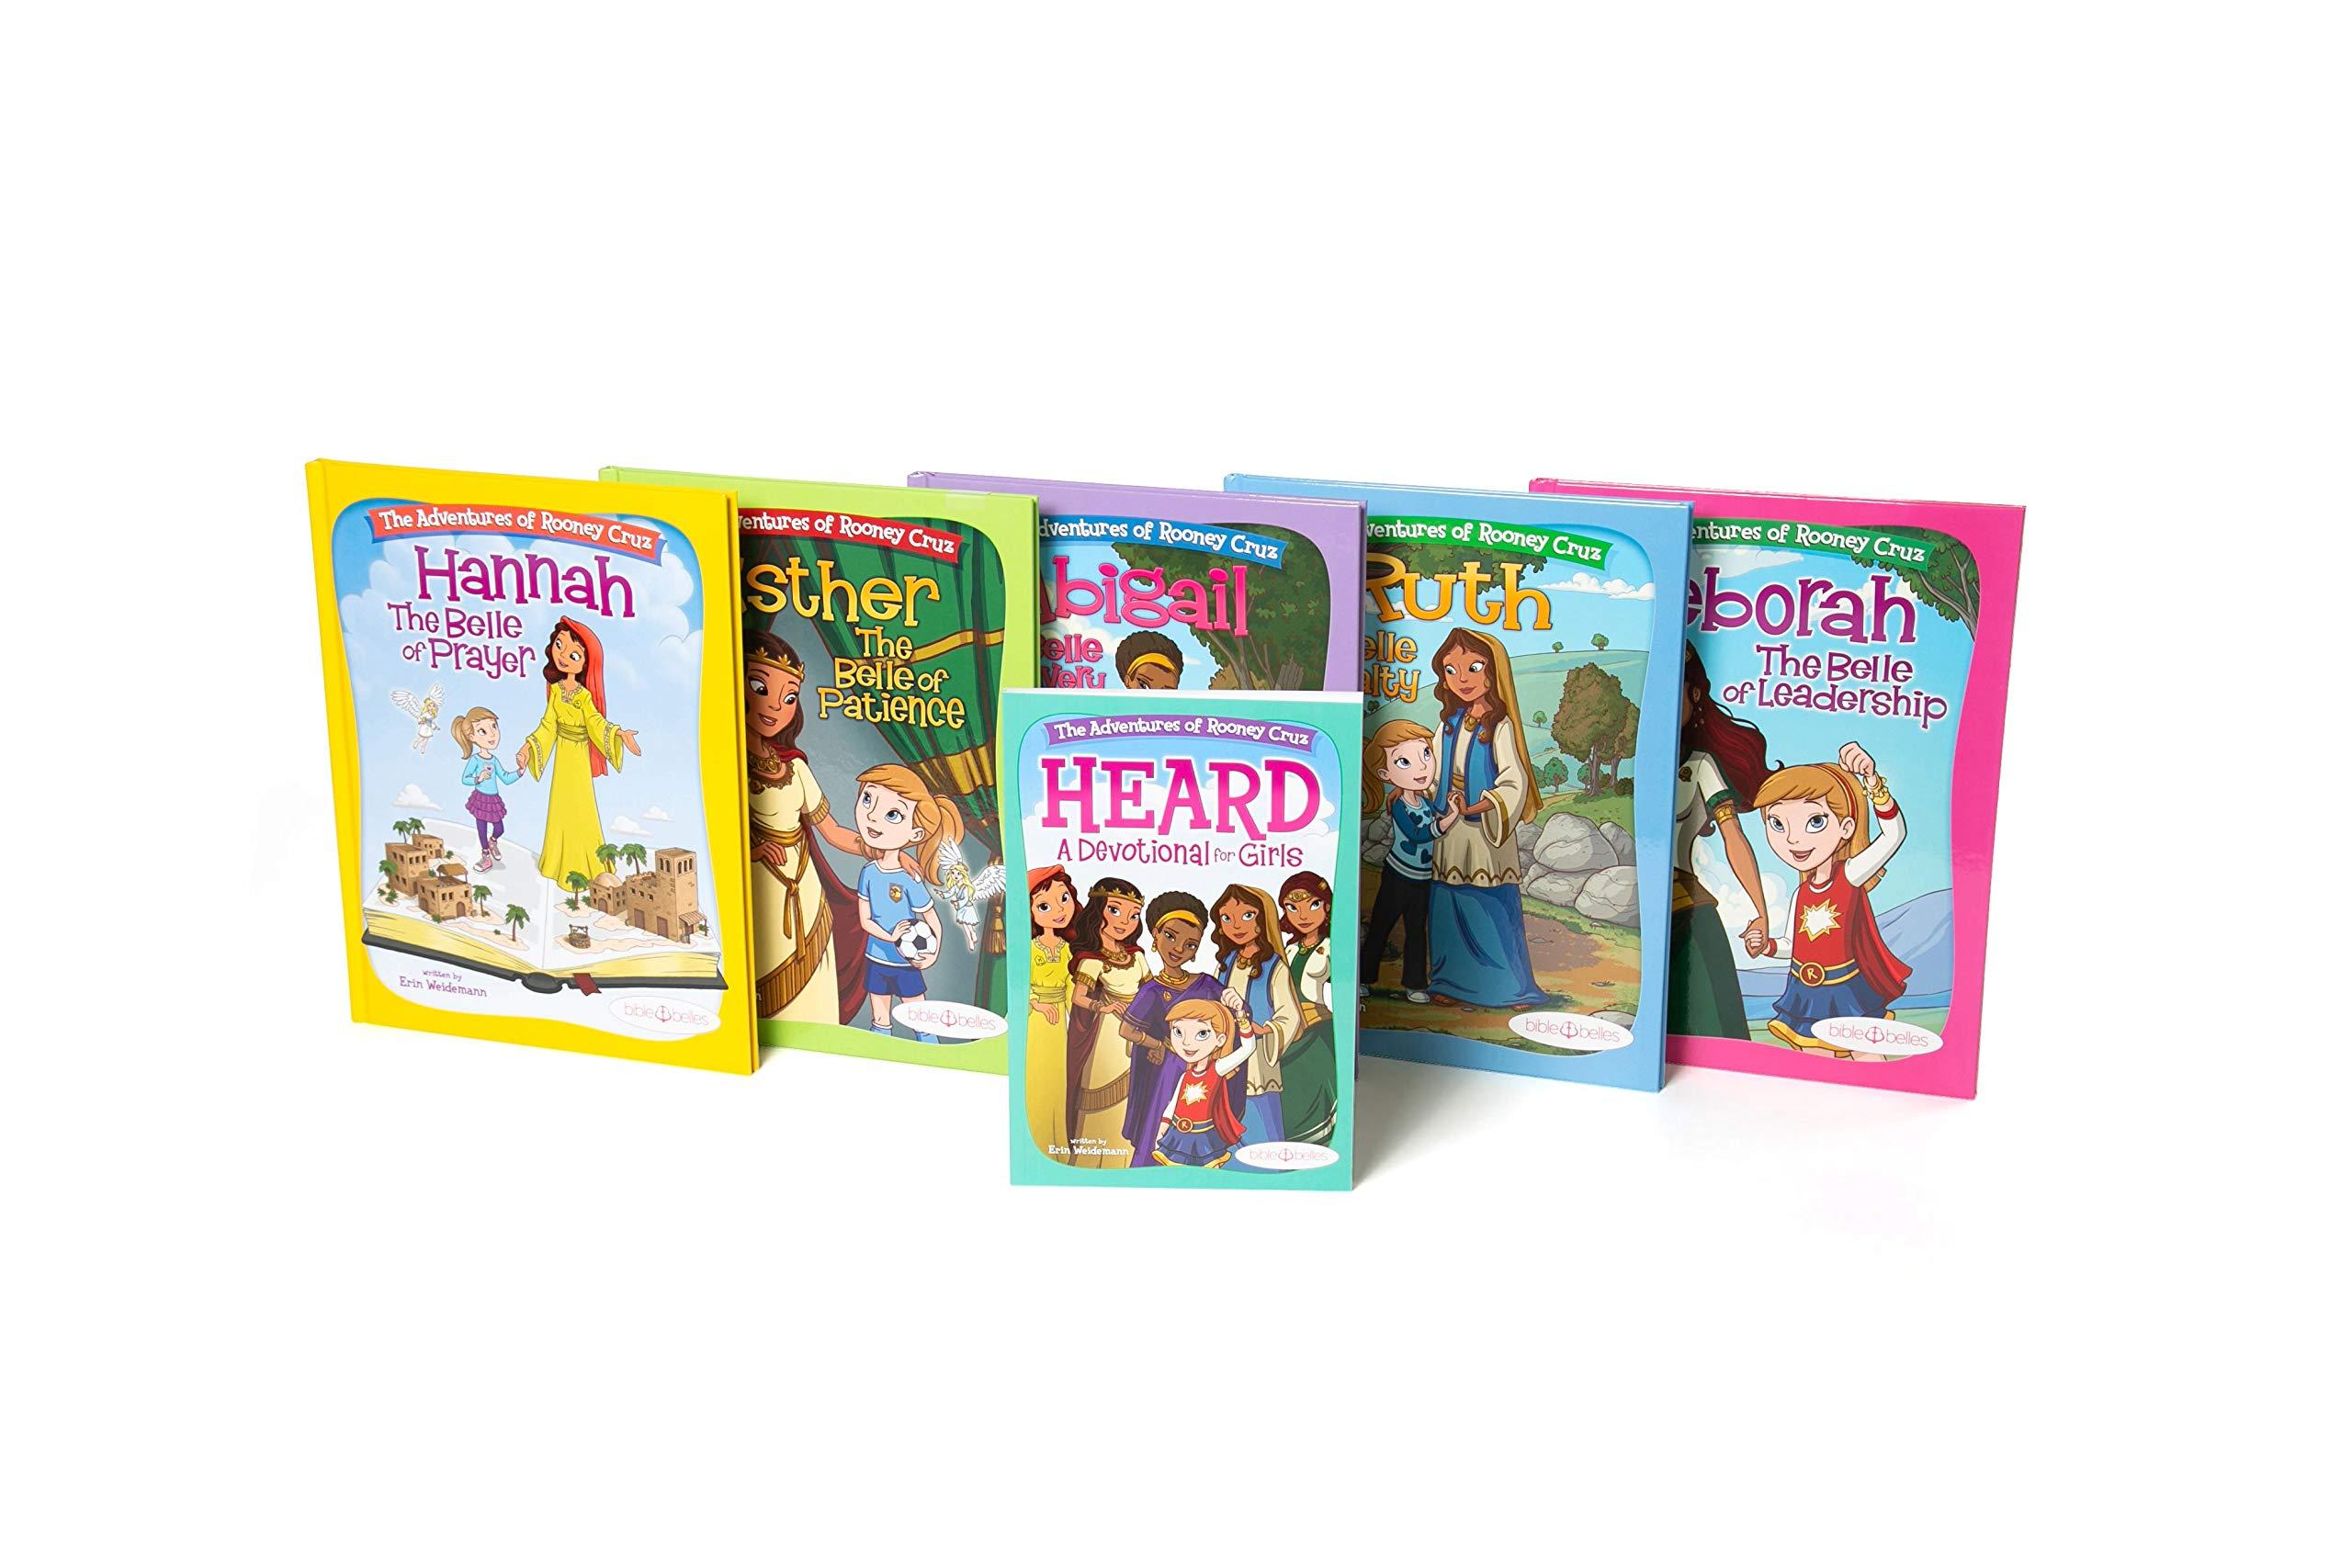 Bible Belles Christian Children's Book Set, The Adventures Of Rooney Cruz Bible Story Books, Age 4 – 10, Set Of 5